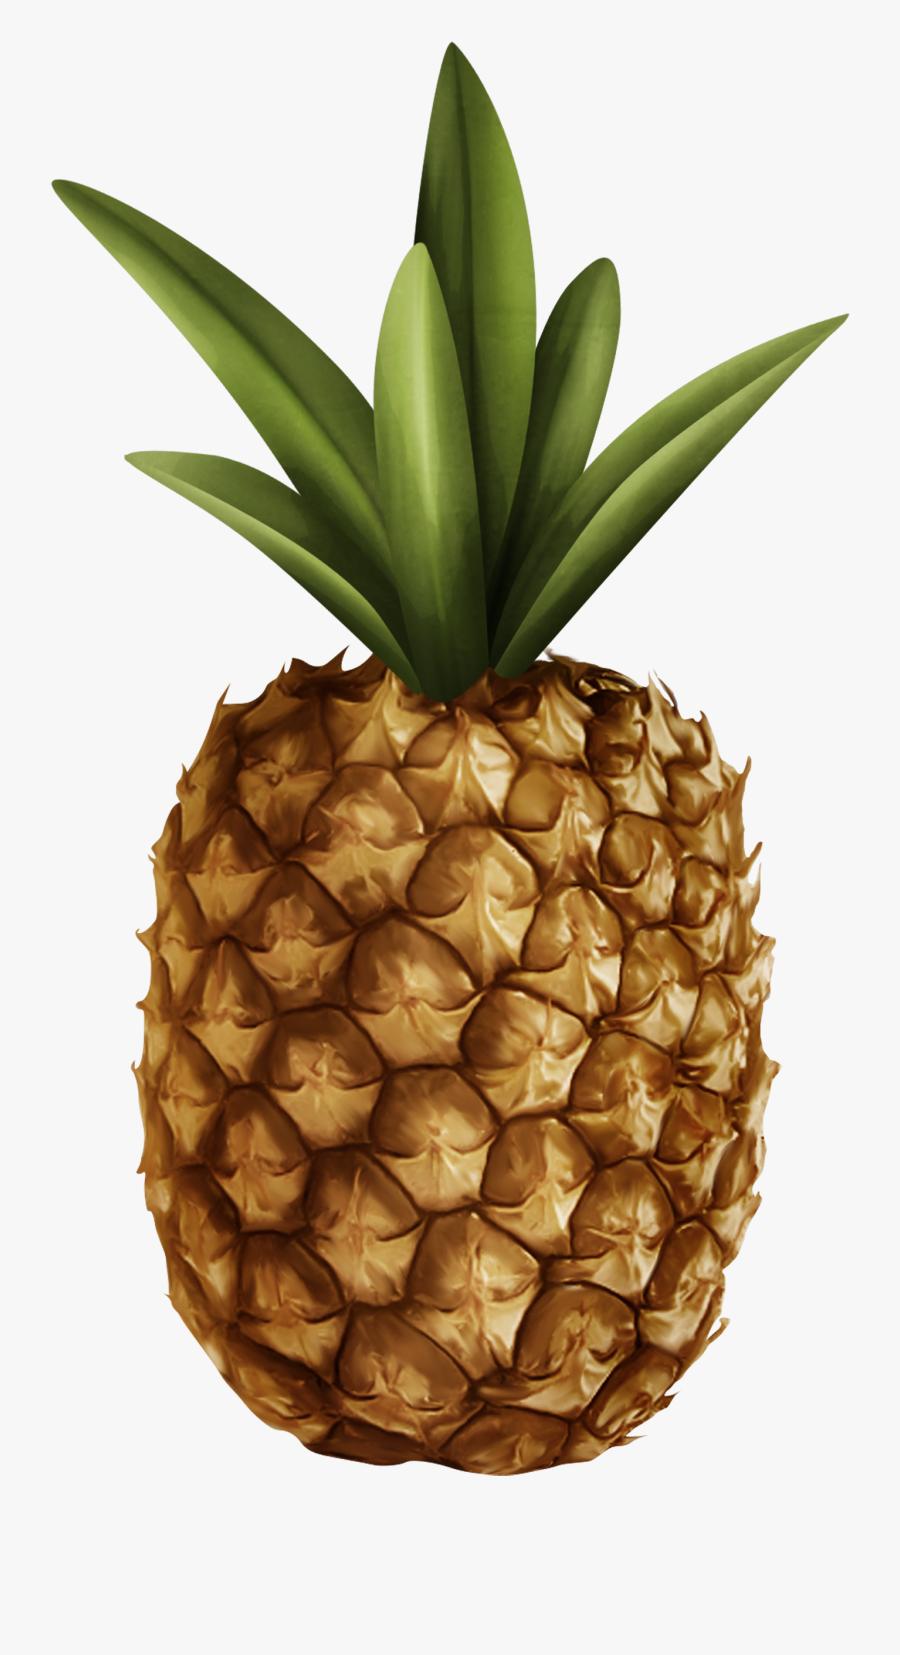 Pineapple Clipart Web - Pineapple, Transparent Clipart